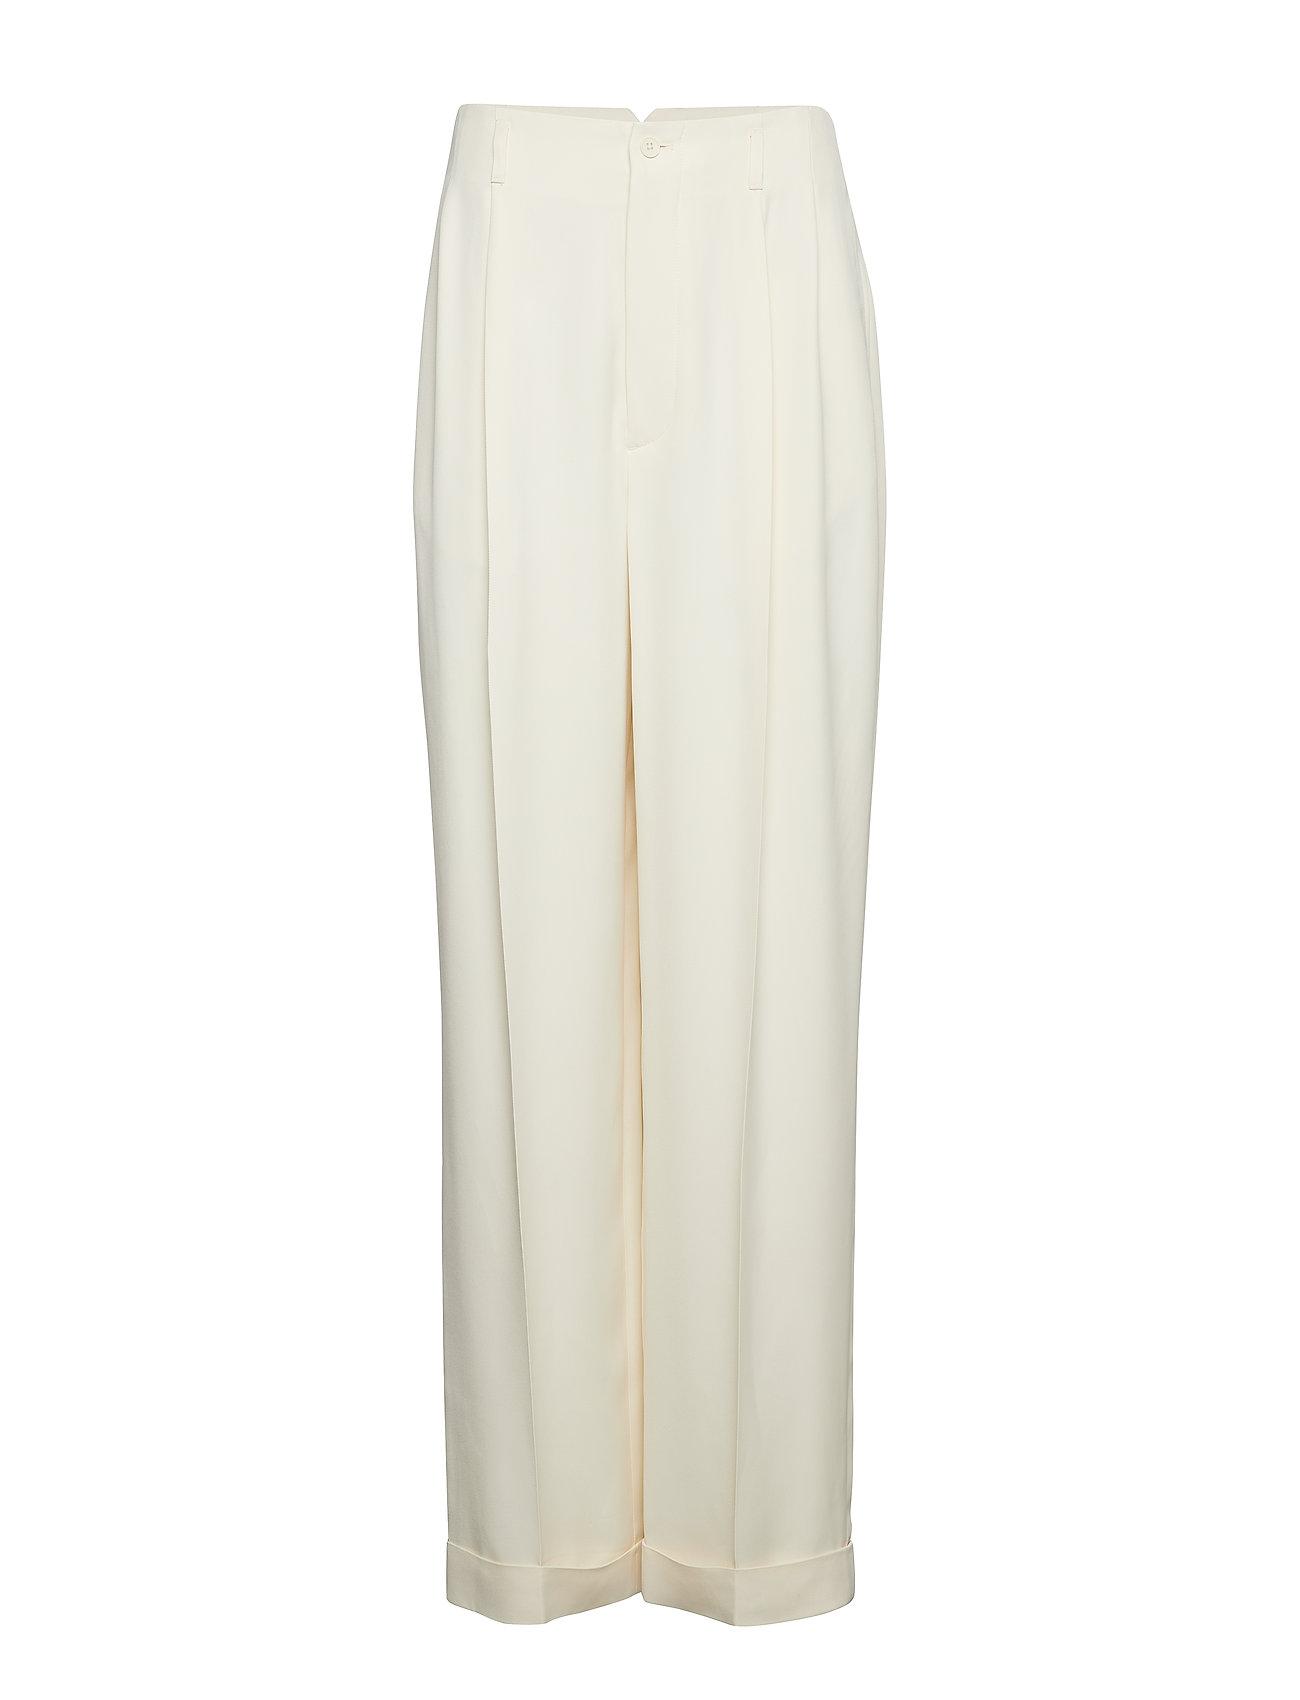 Polo Ralph Lauren Twill Wide-Leg Pant - GUIDE CREAM